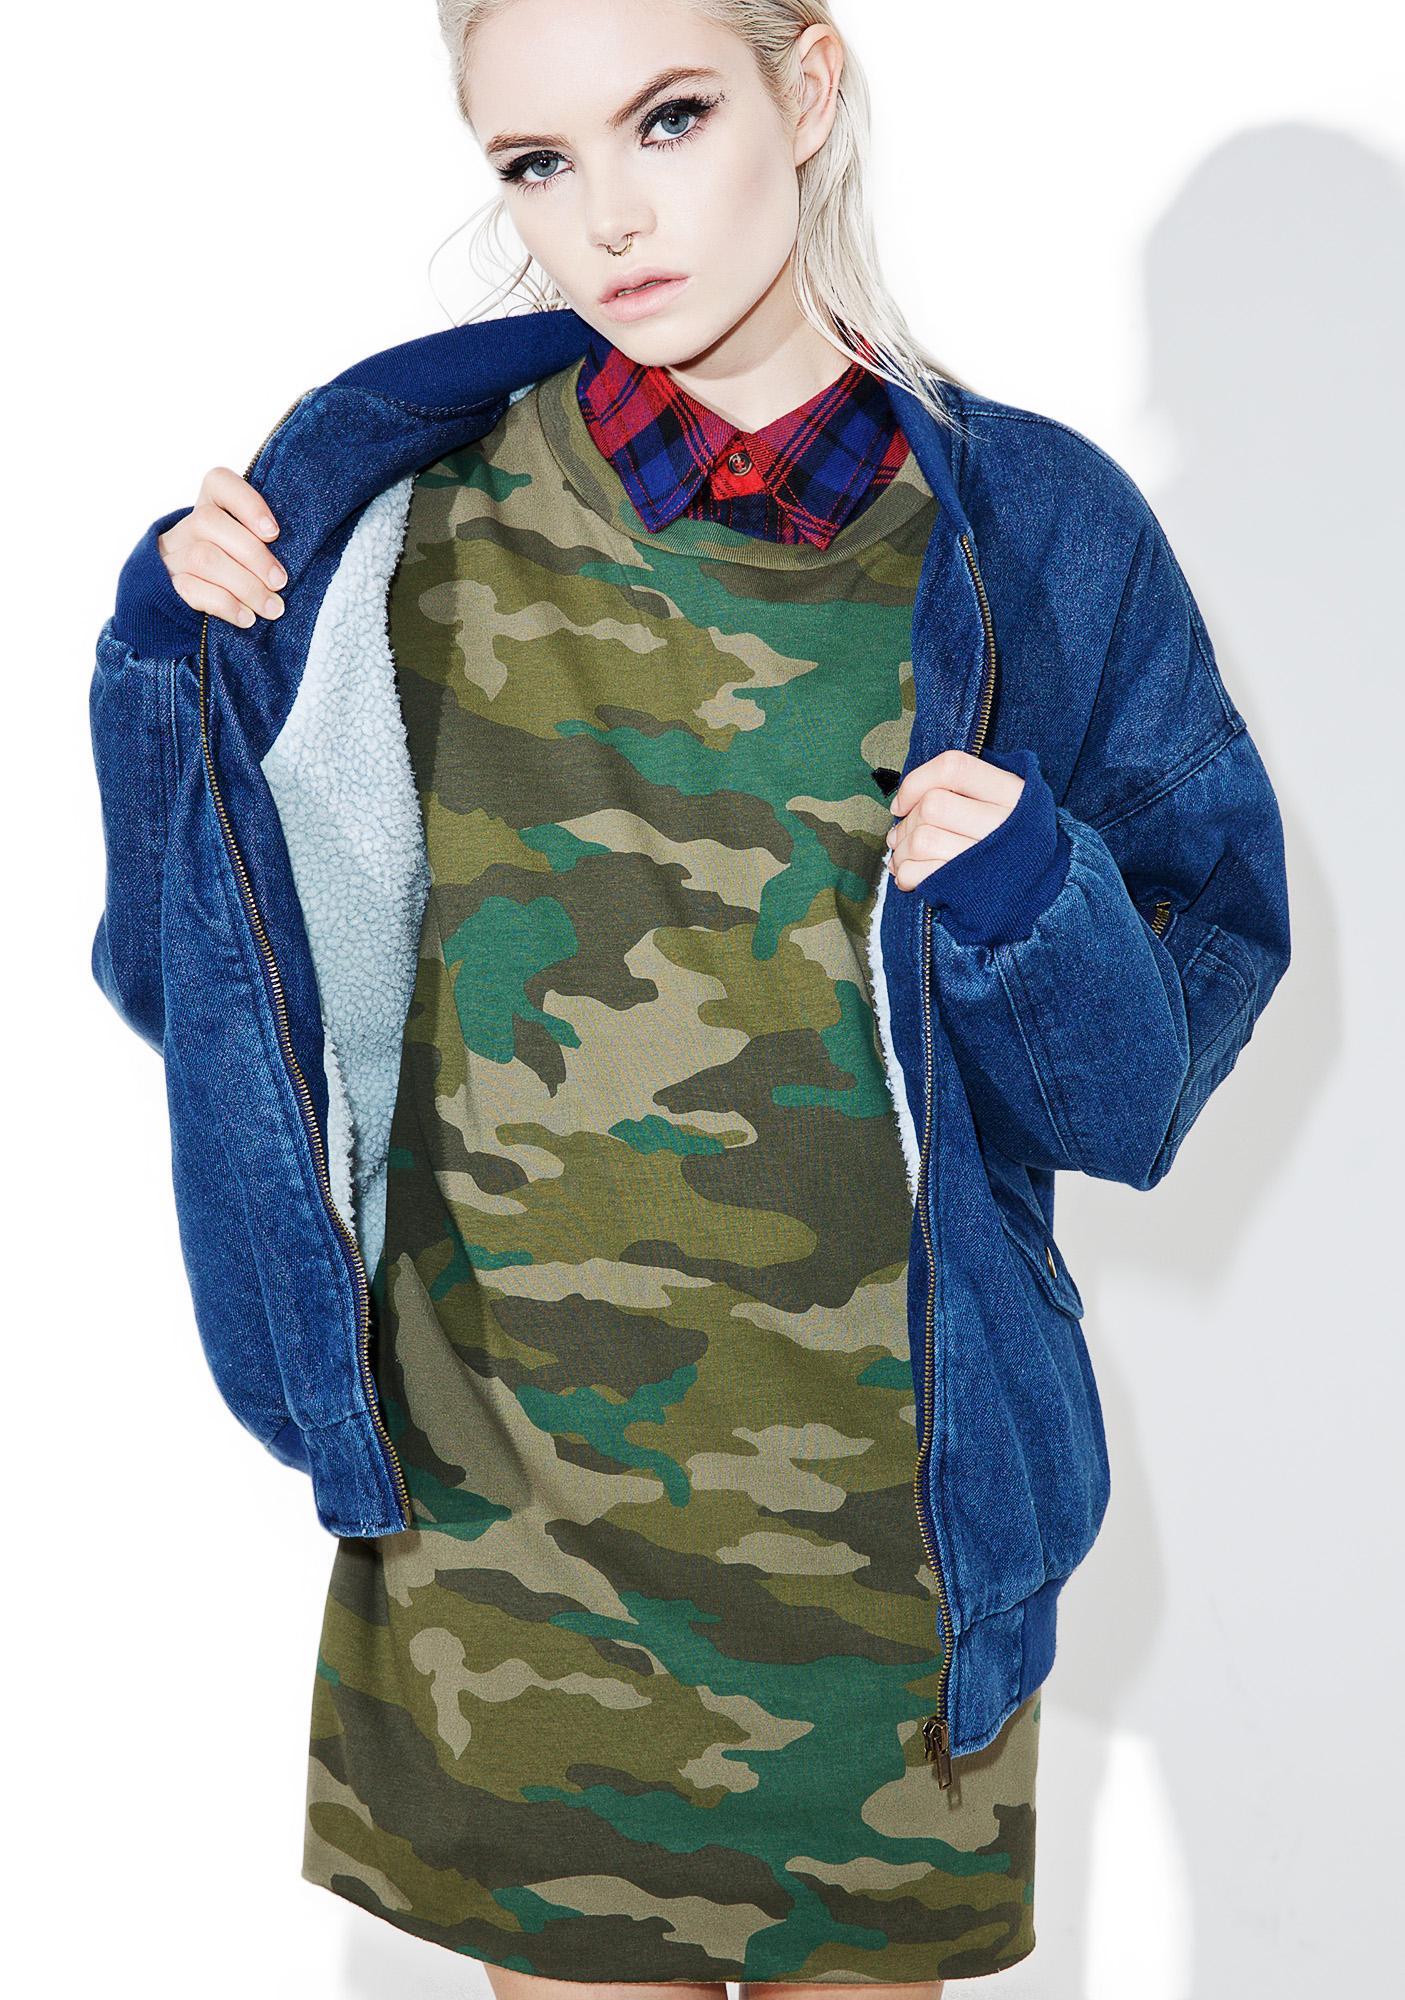 J.O.A Denim Bomber Jacket